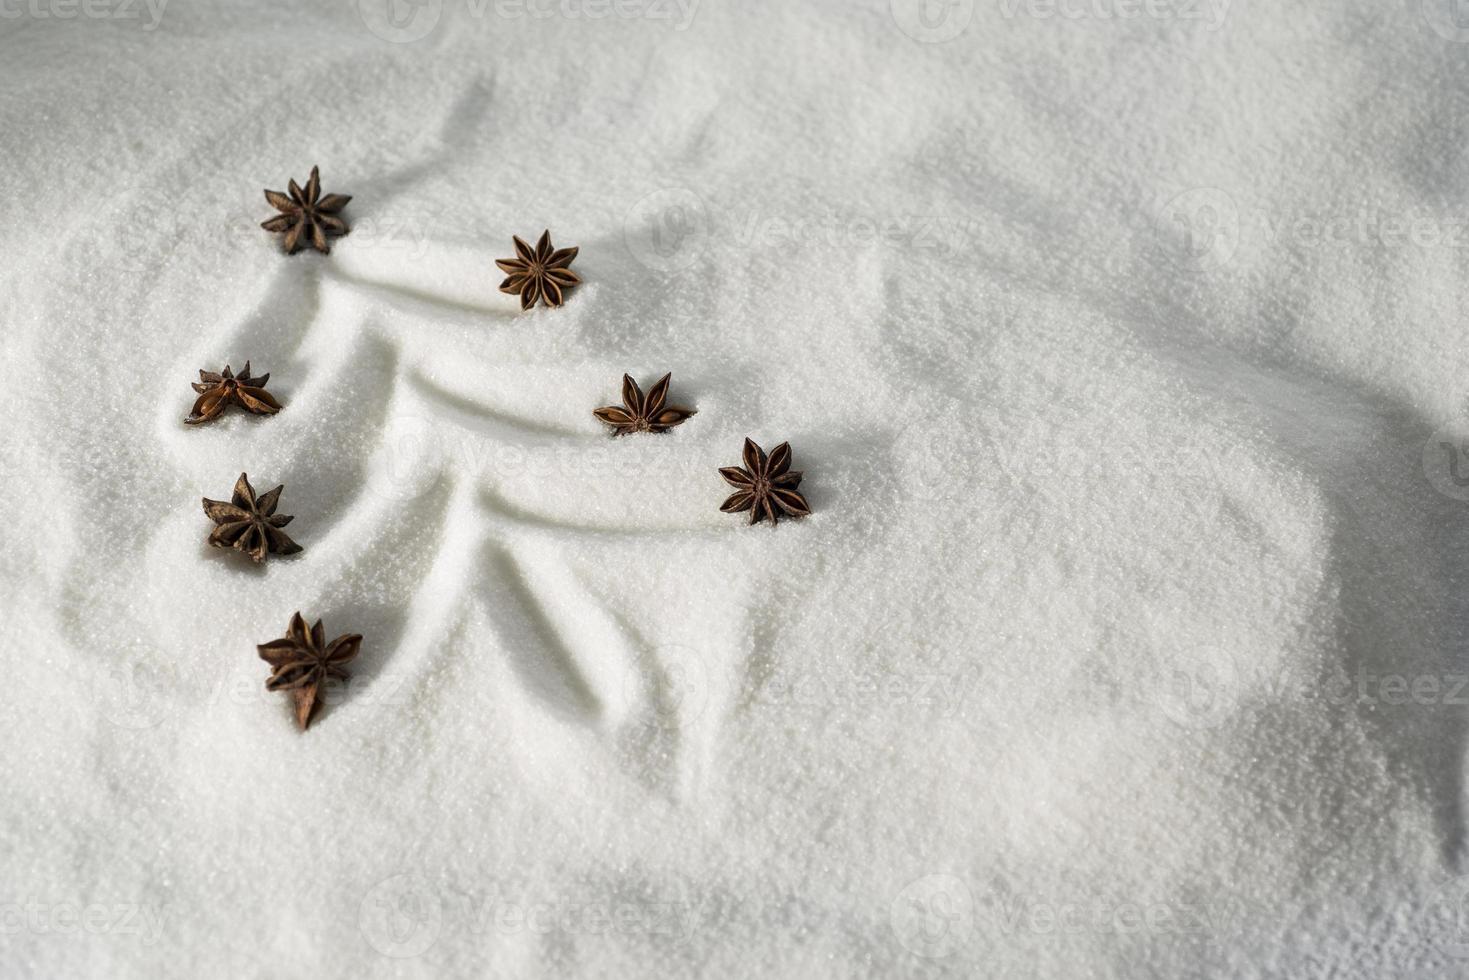 Christmas tree drawn in snow photo